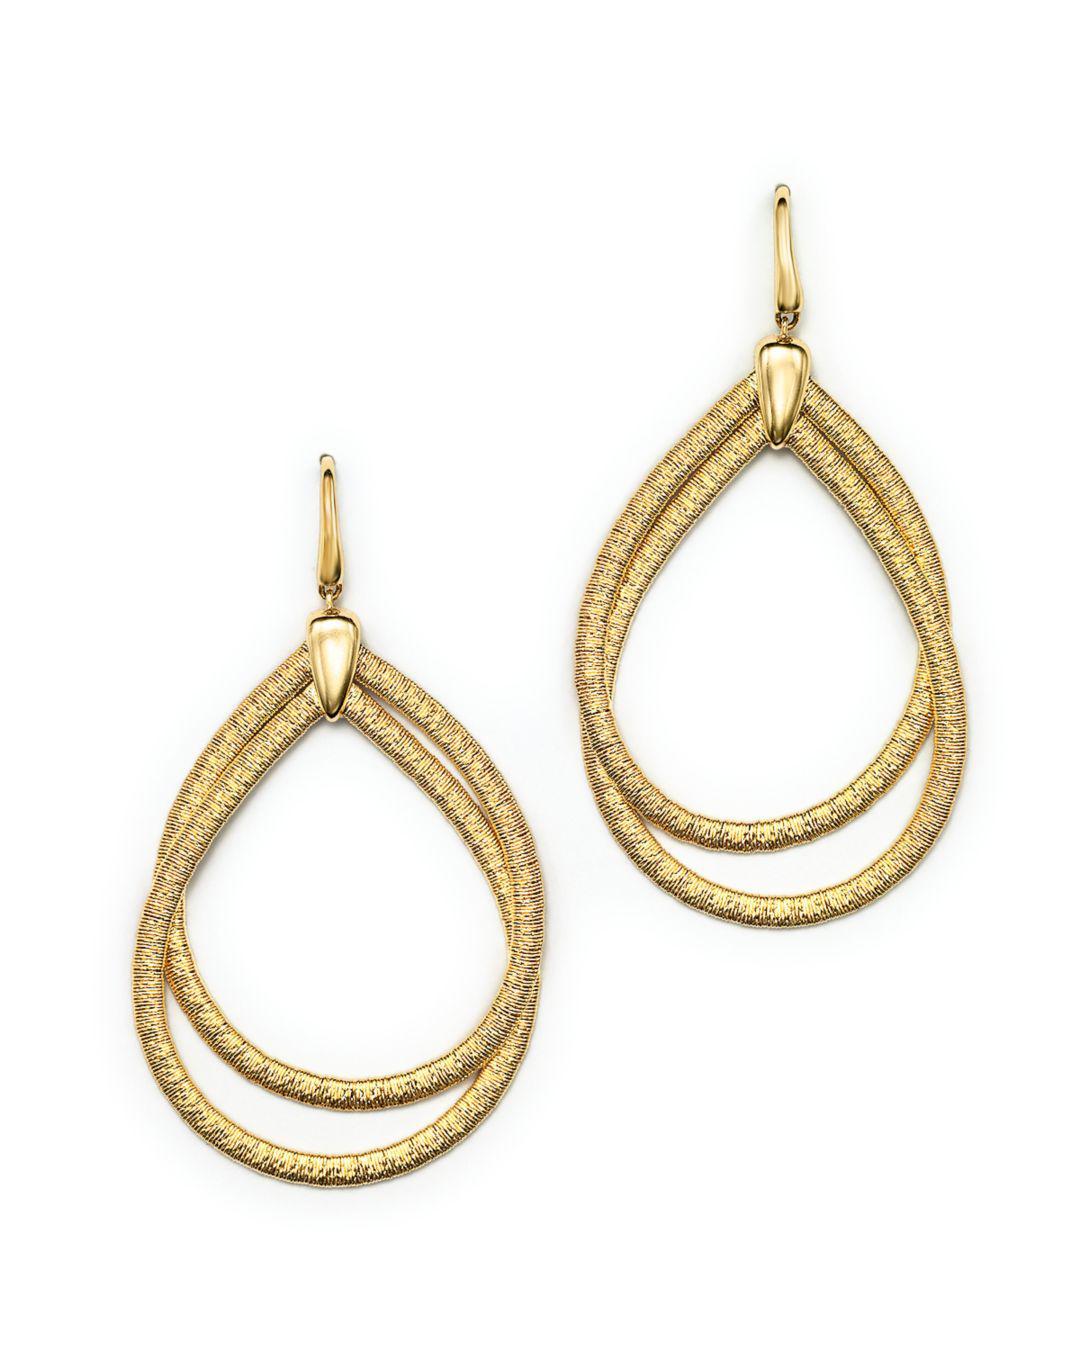 5e9bf30db Marco Bicego 18k Yellow Gold Cairo Drop Earrings in Metallic - Lyst